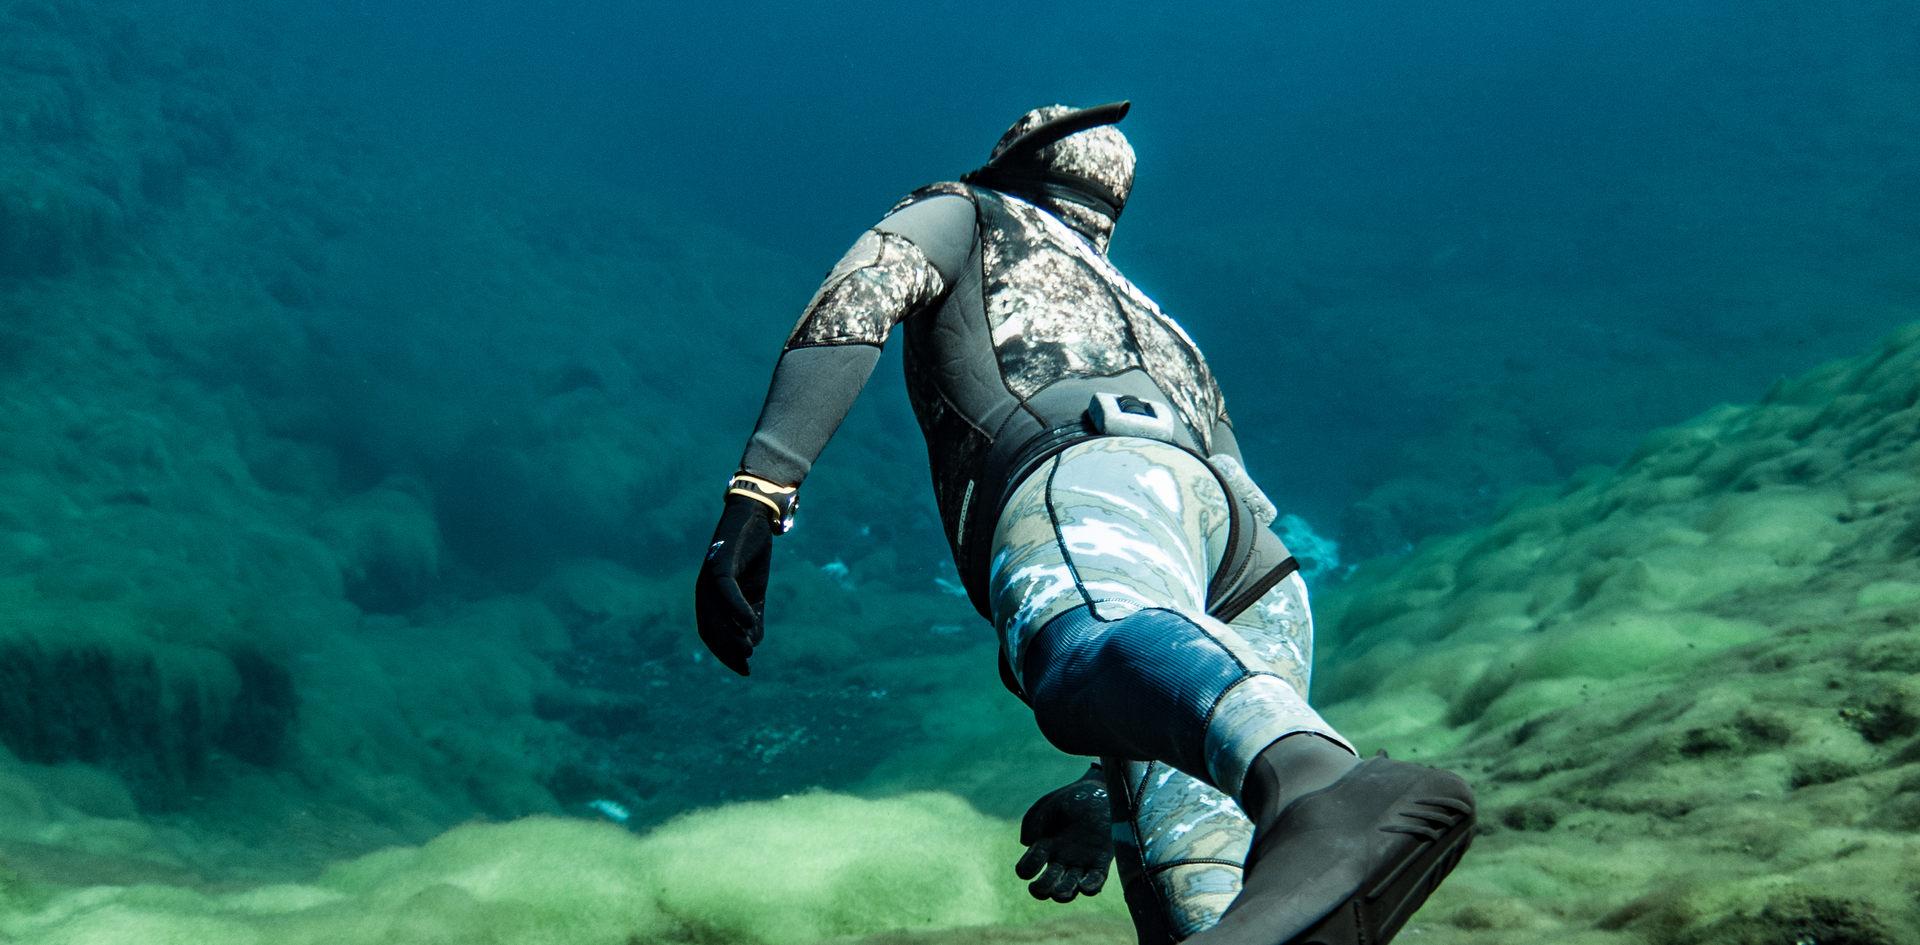 Freediving Sinkhole